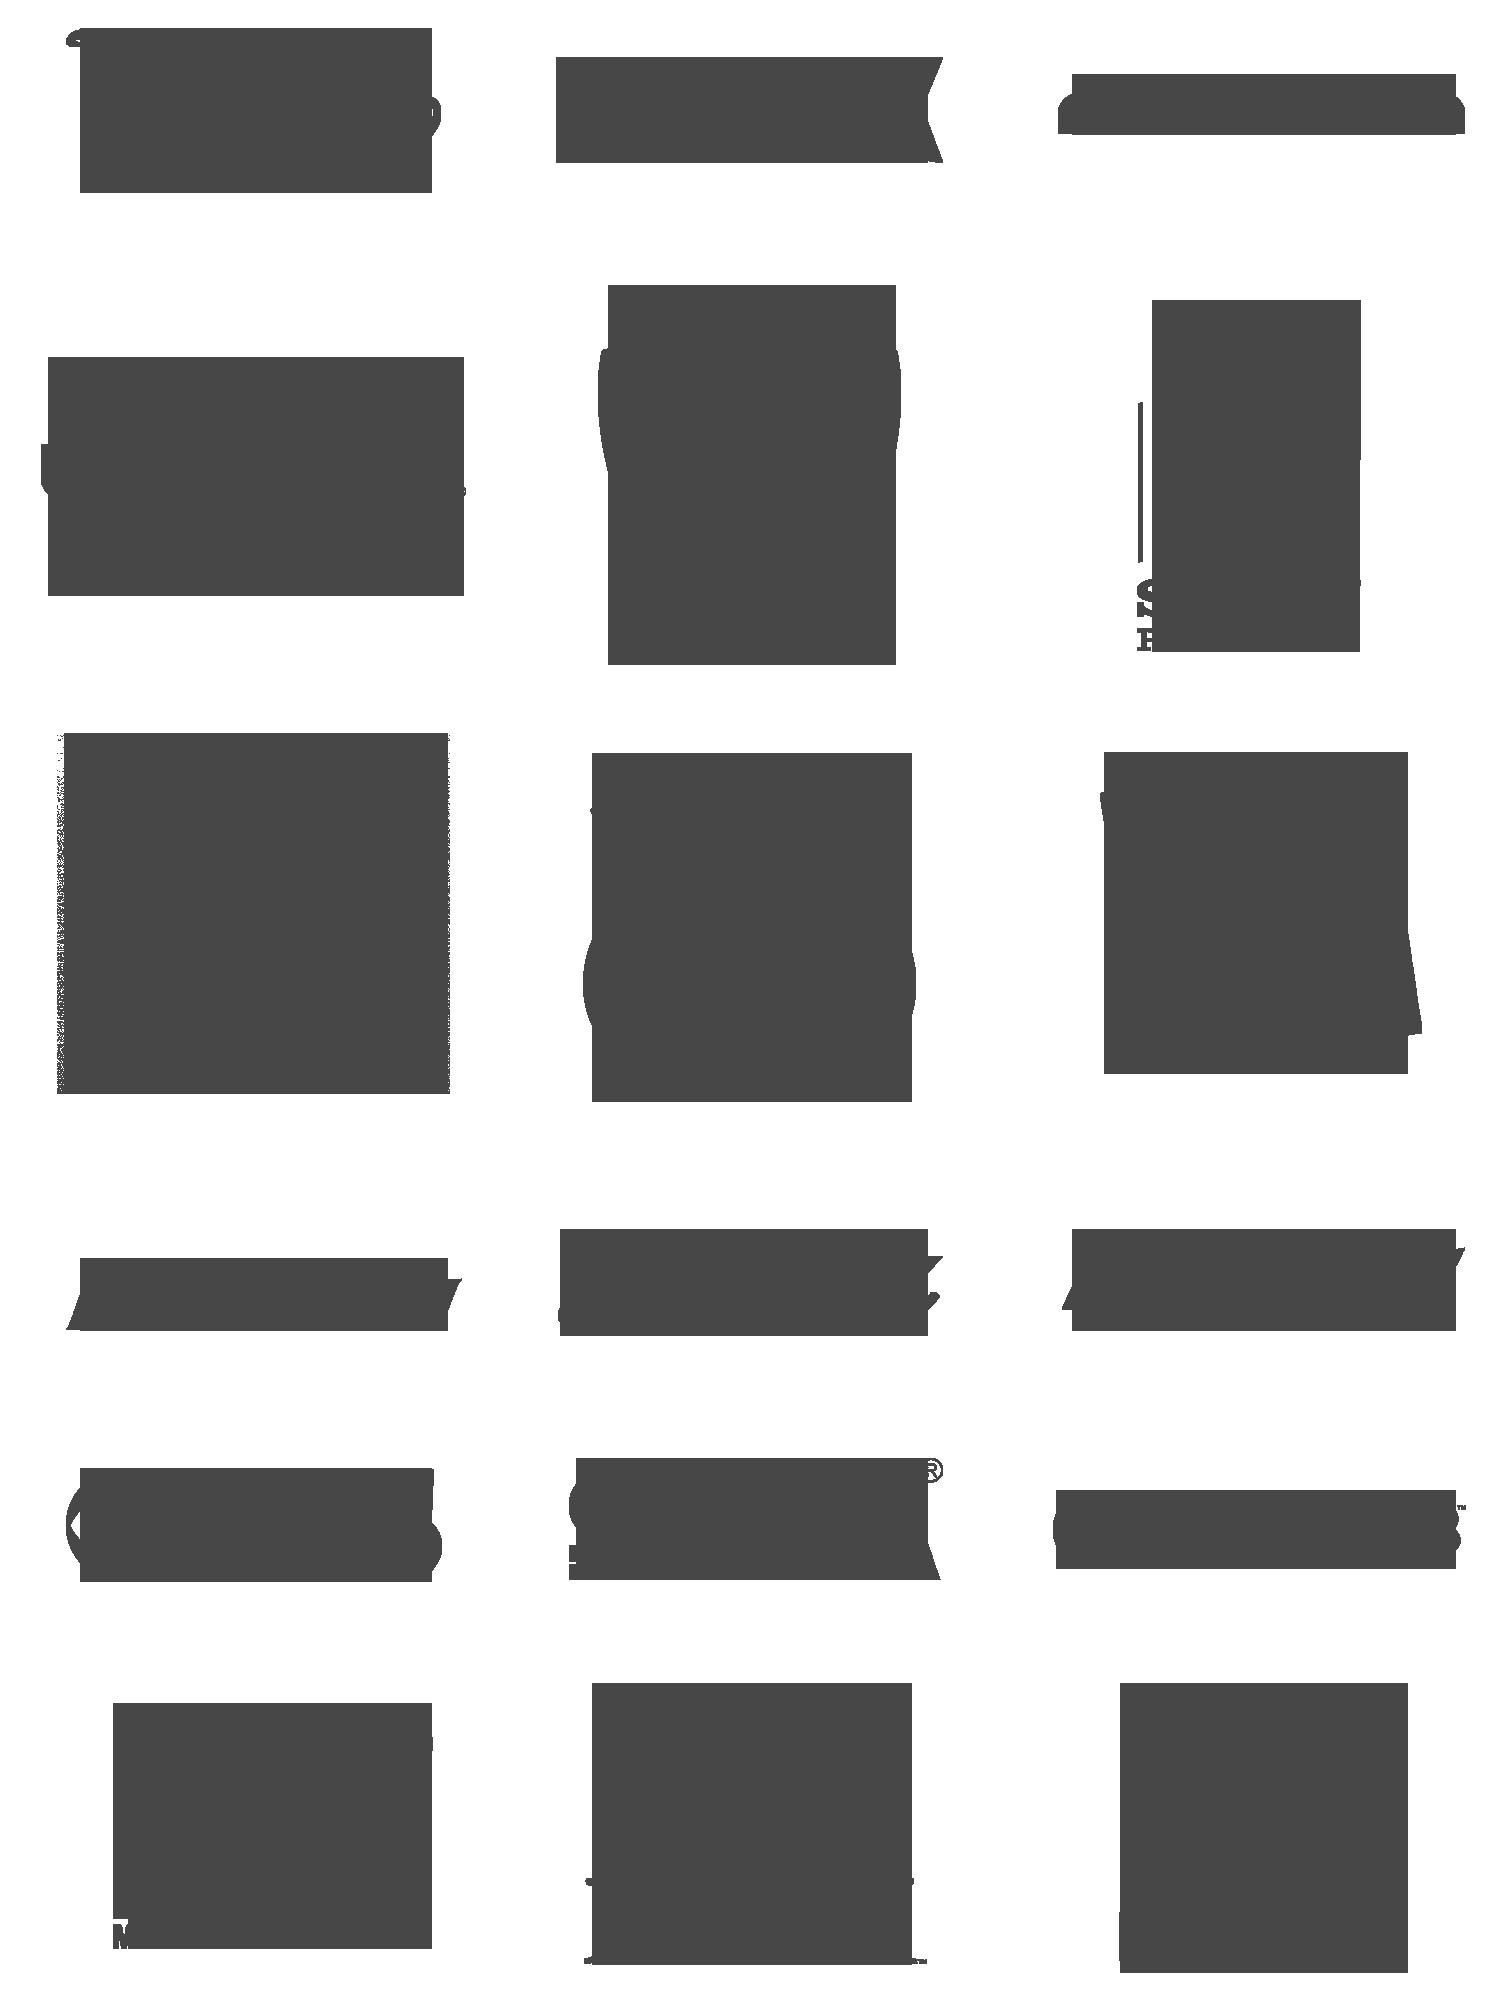 https://www.shirtstore.dk/pub_docs/files/OfficialMerchandise/Lecensed_Logos.png